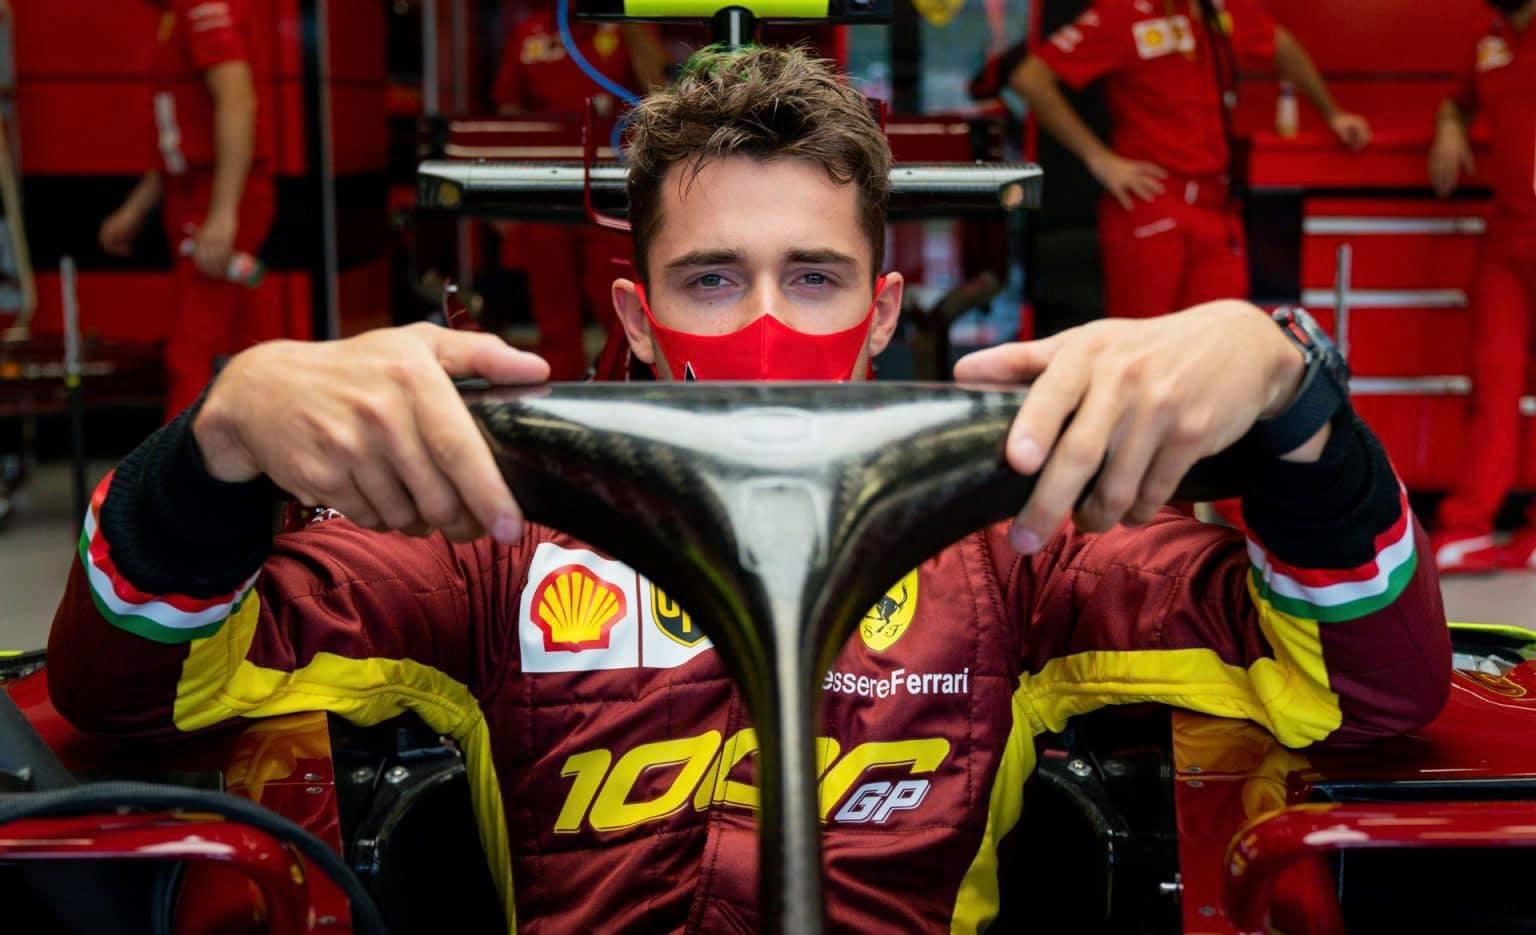 Analisi Ferrari GP Mugello 2020 - PeriodicoDaily Sport